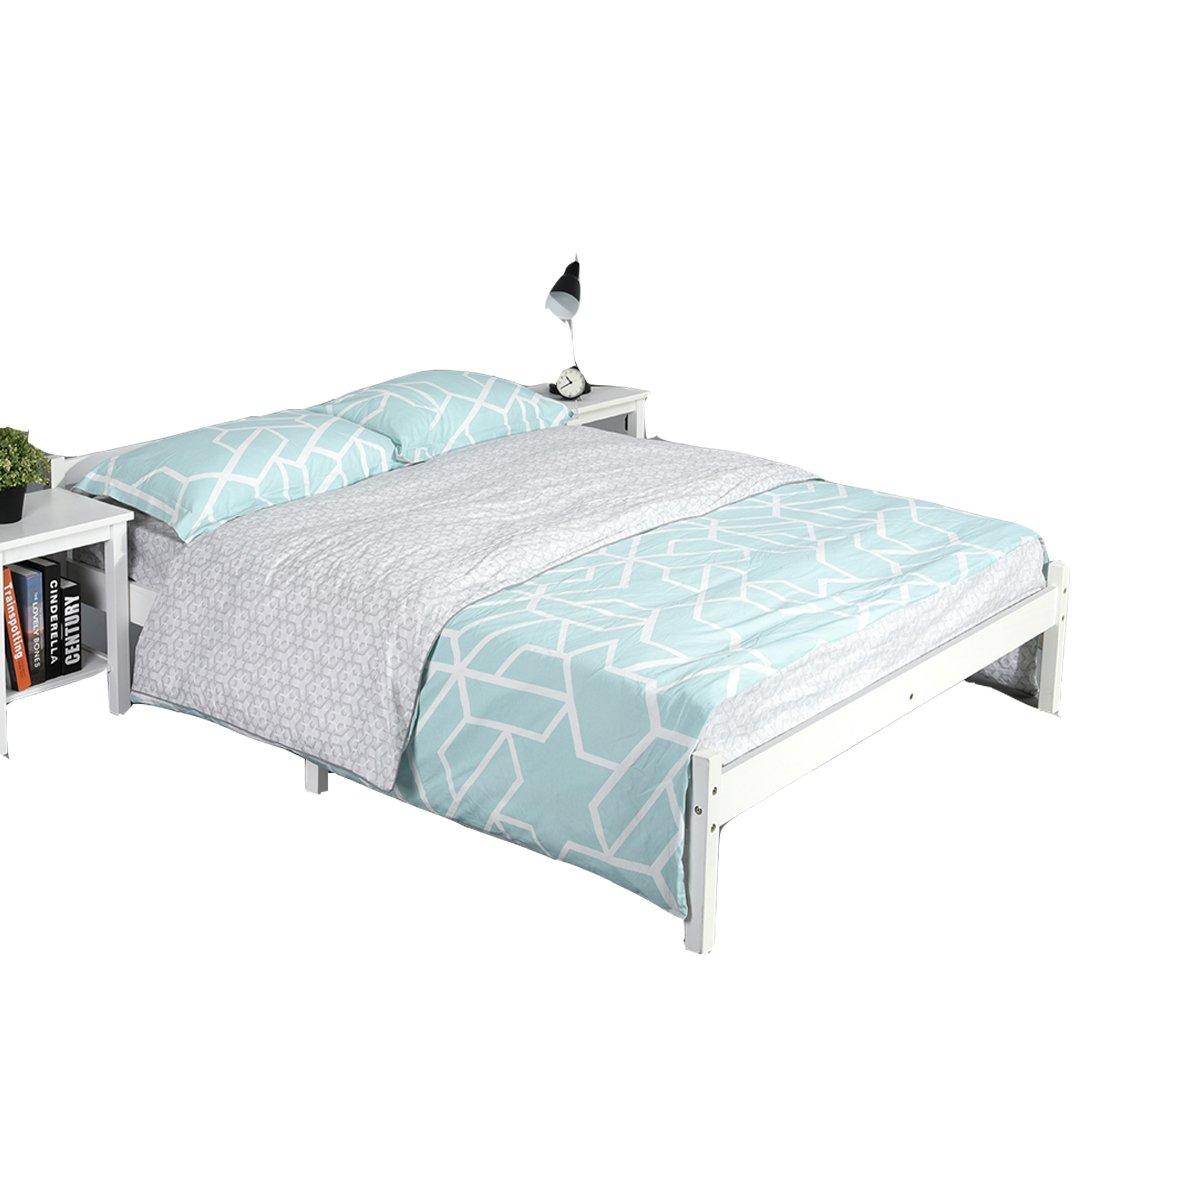 DORAFAIR 3ft Single Bed Frame in Natural Wood,Strong Structure Solid Pine Wood Single Bed Frame for Adult Kids Child or Children, fit 90 * 190 Mattress